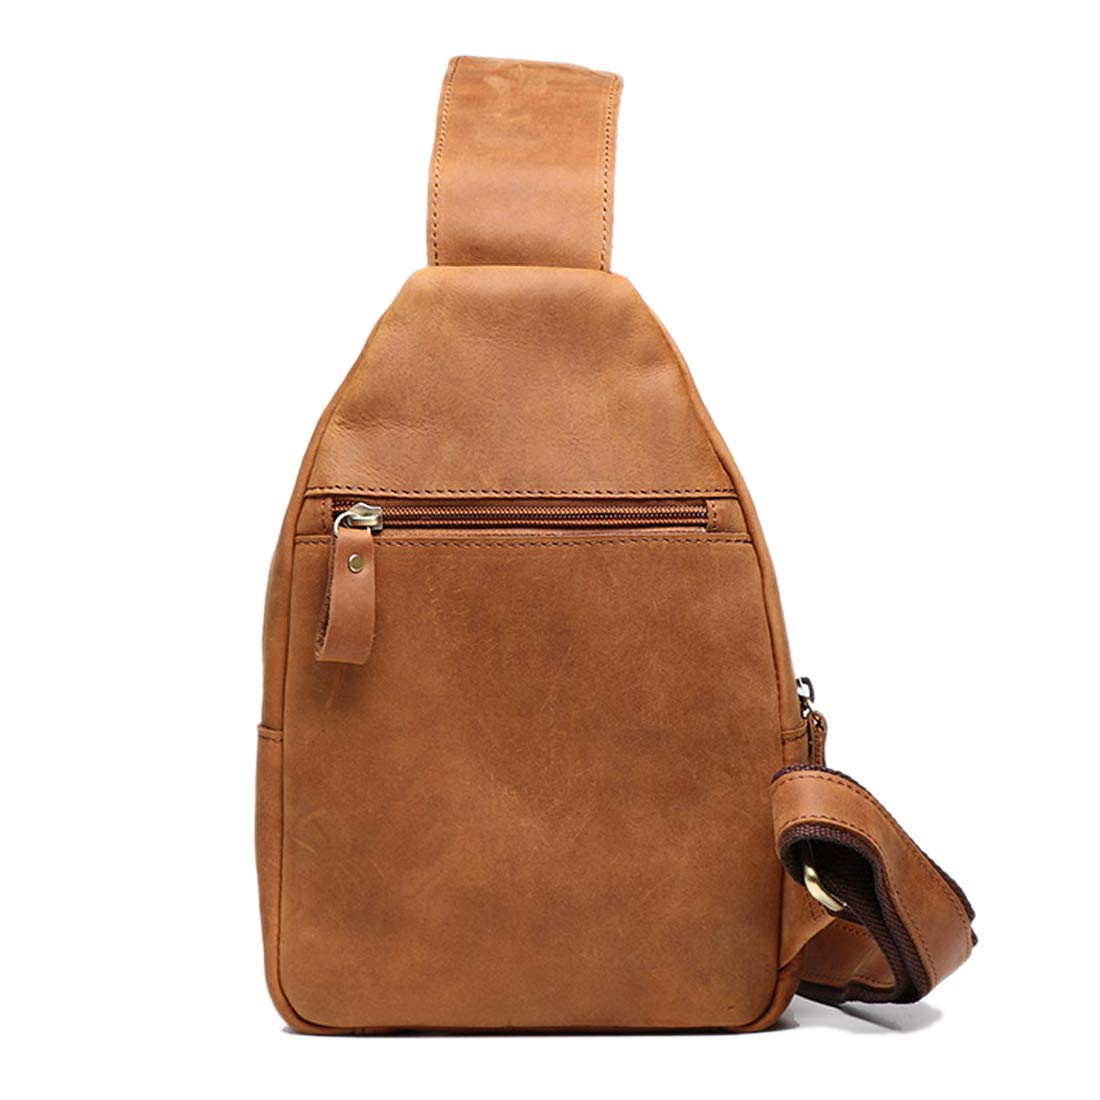 Leparvi Sling Chest Bag Crossbody Bag Shoulder Bag for Men or Women